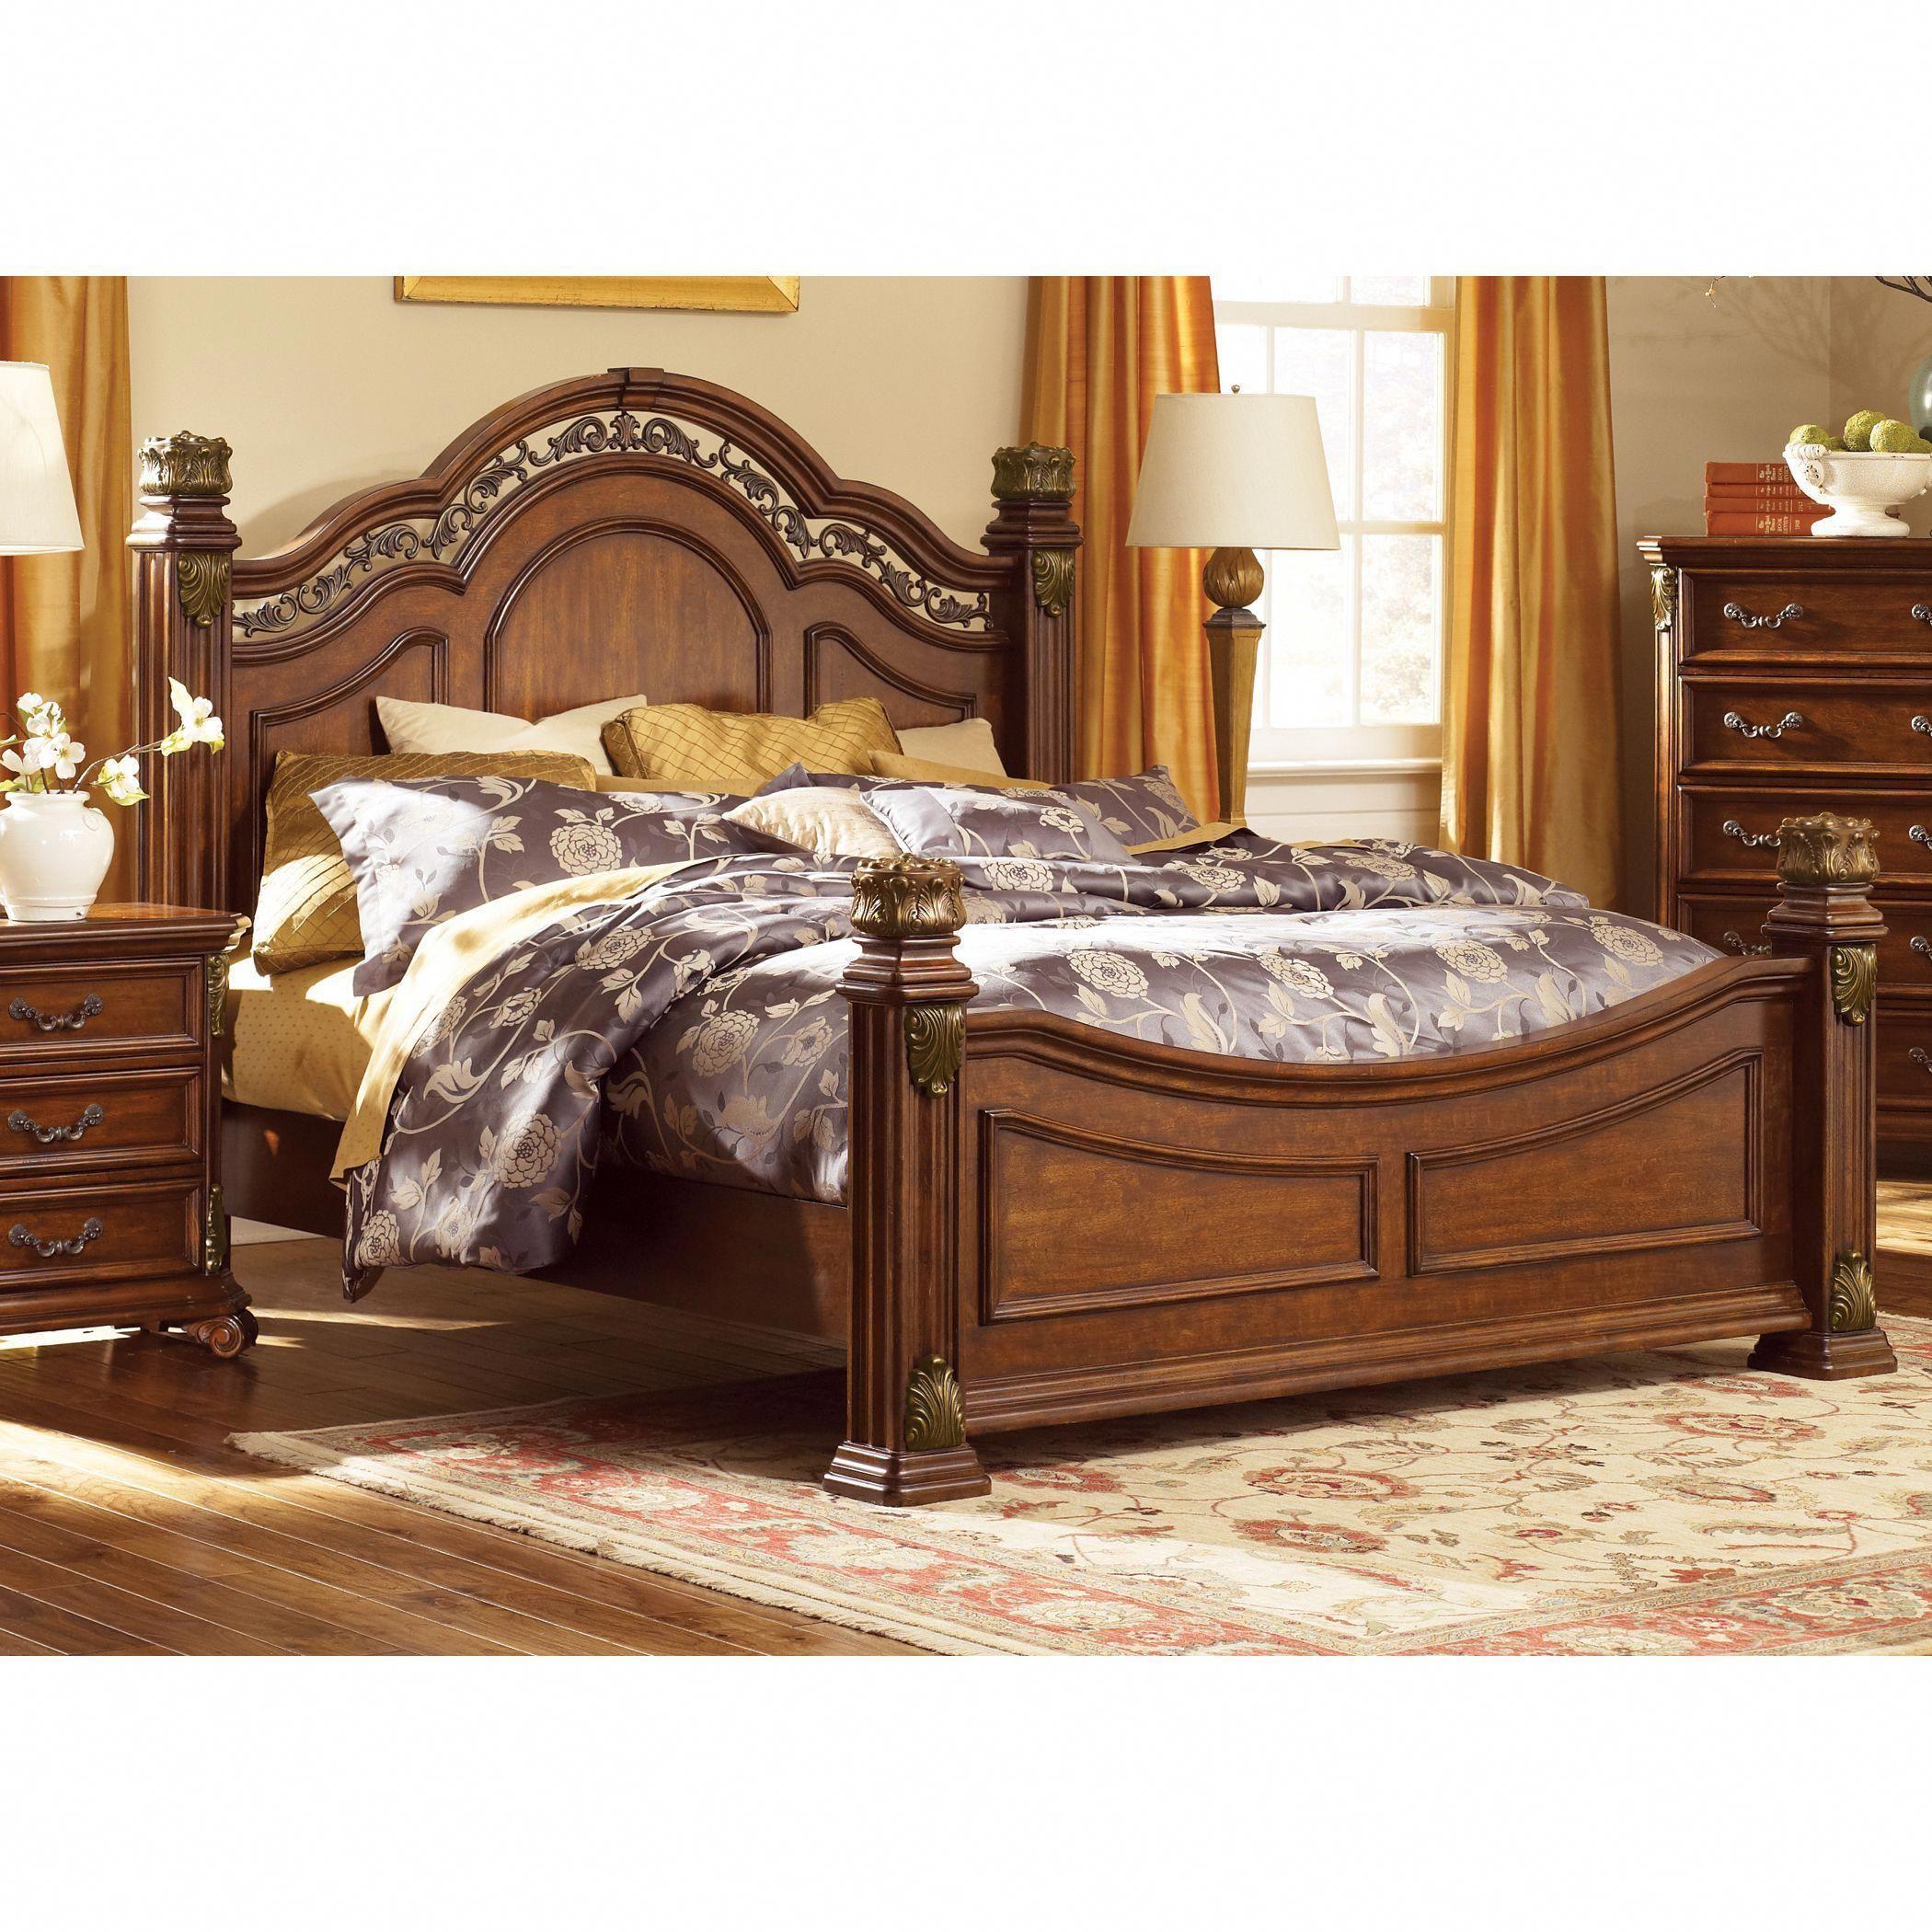 Inexpensive Furniture Websites LuxuryFurnitureBrandsList